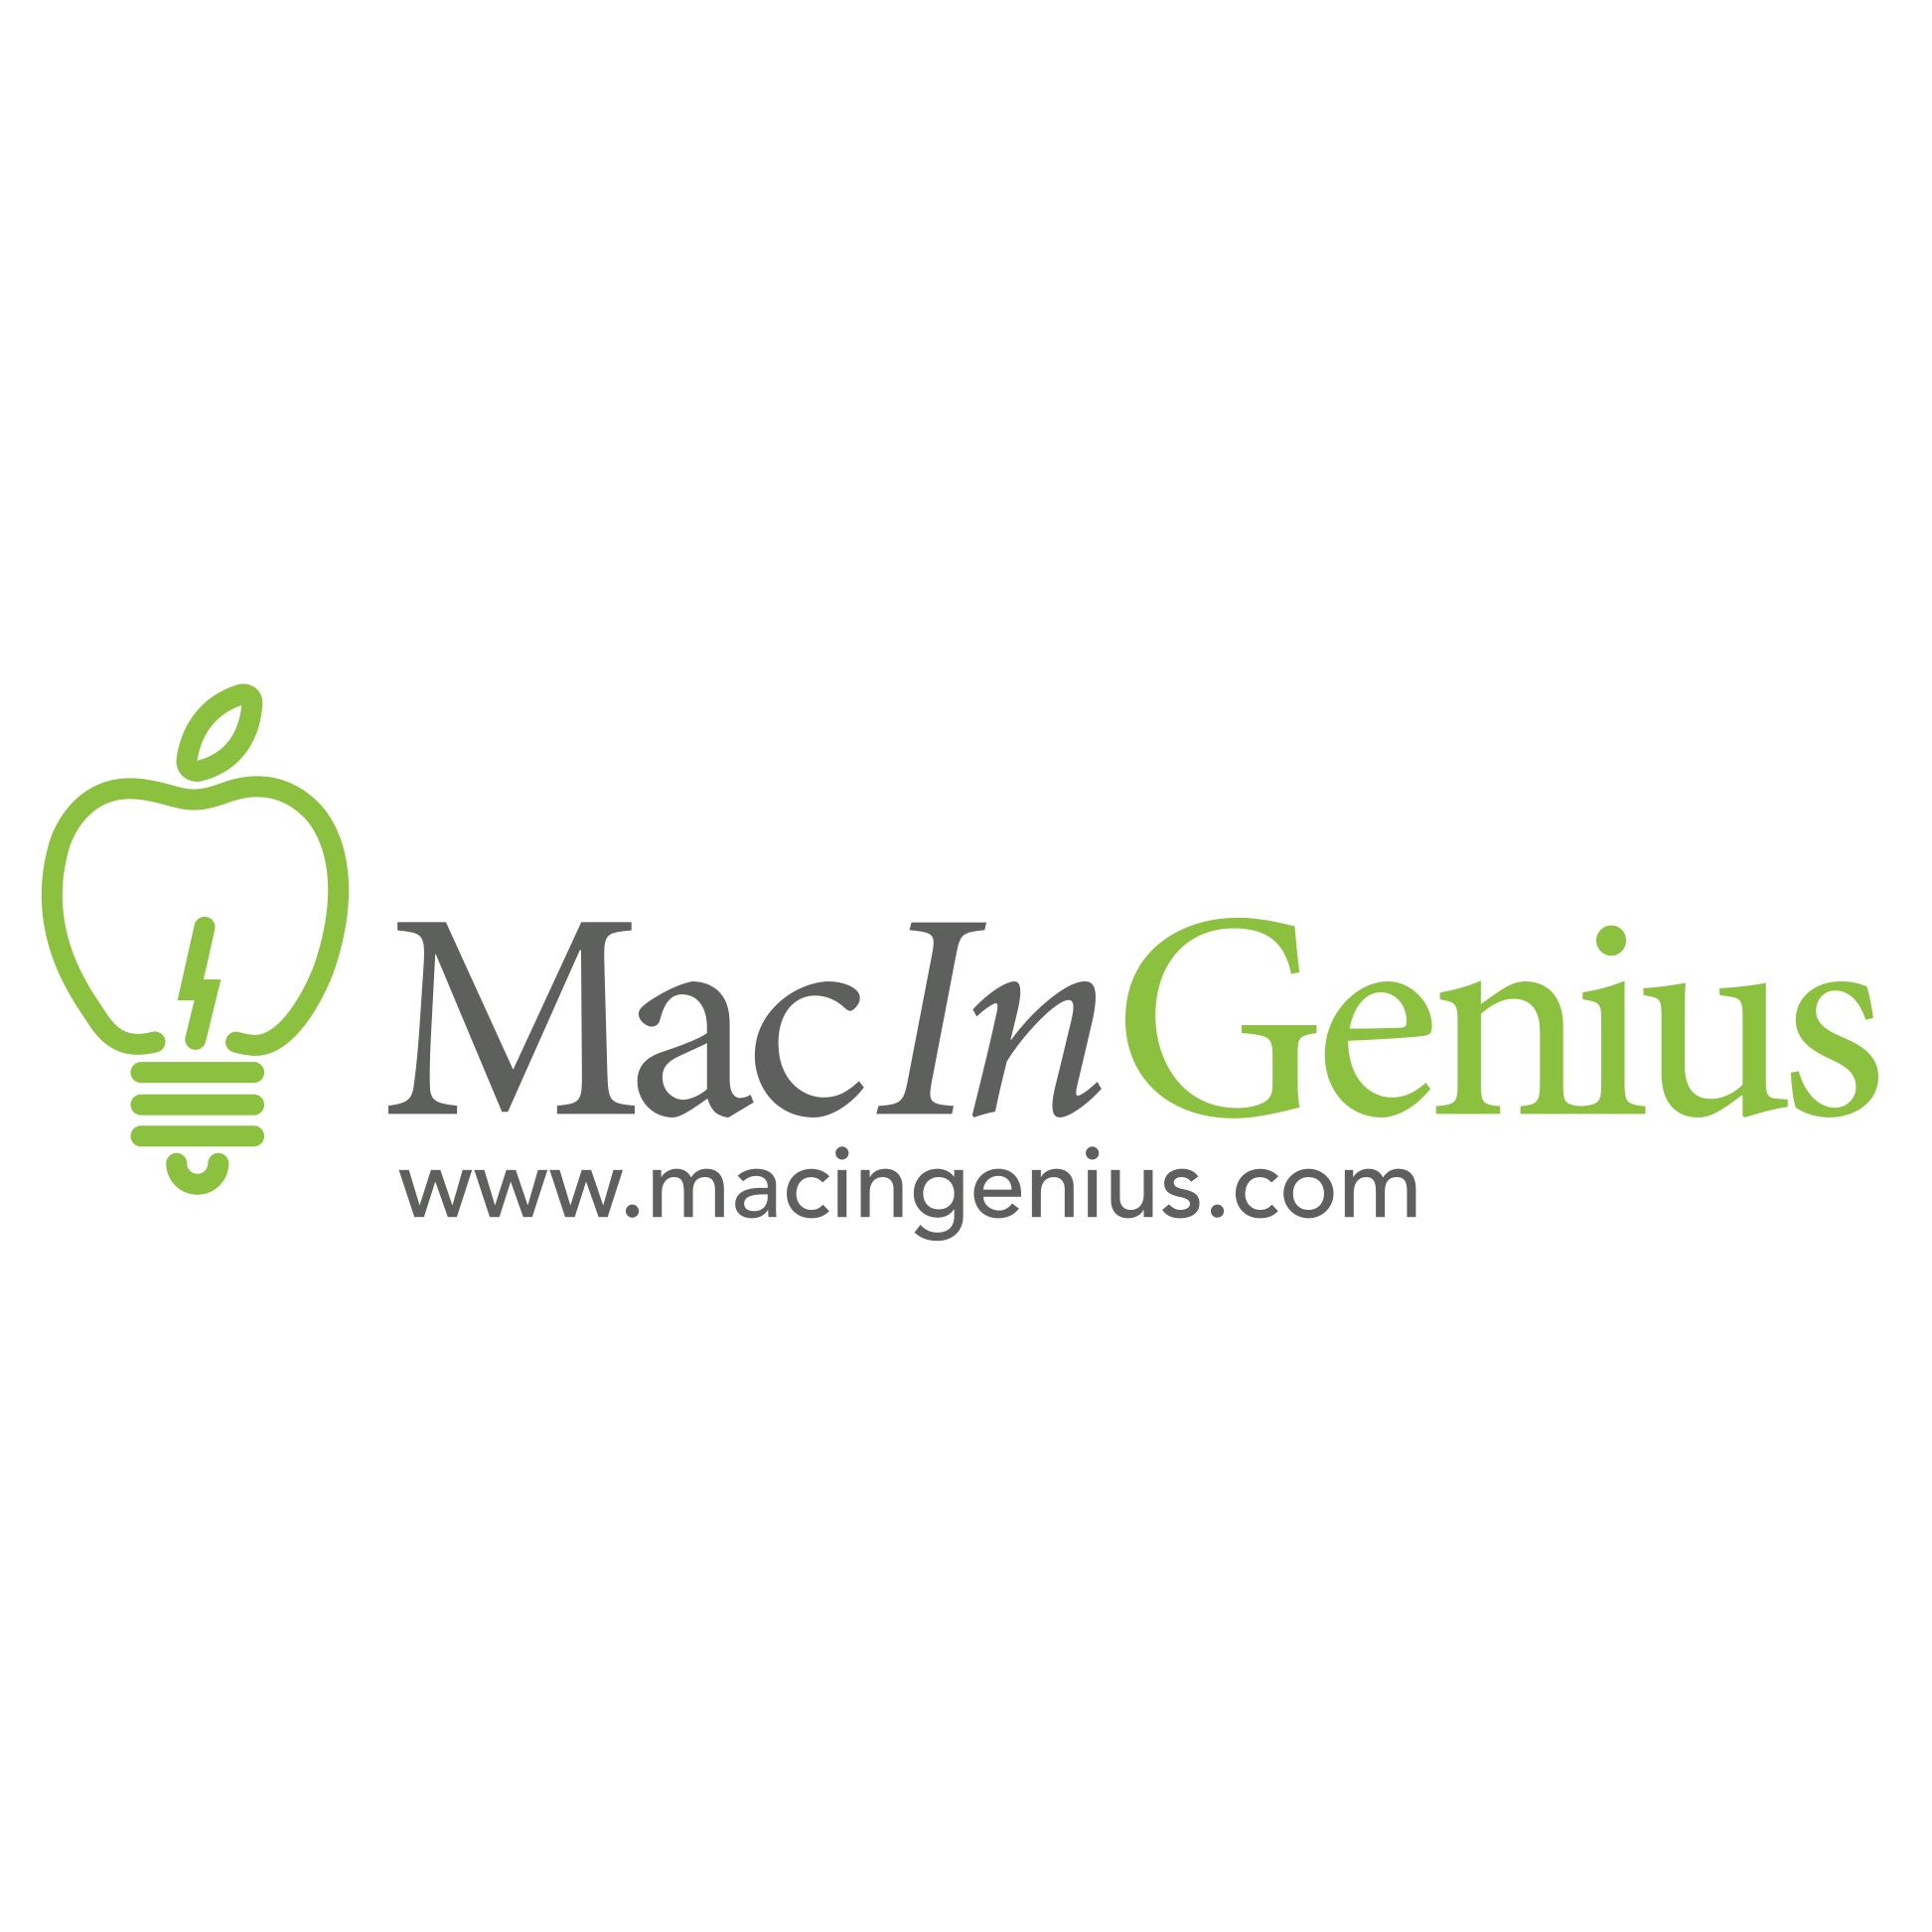 MacInGenius - Arlington, MA 02476 - (781)218-9345 | ShowMeLocal.com